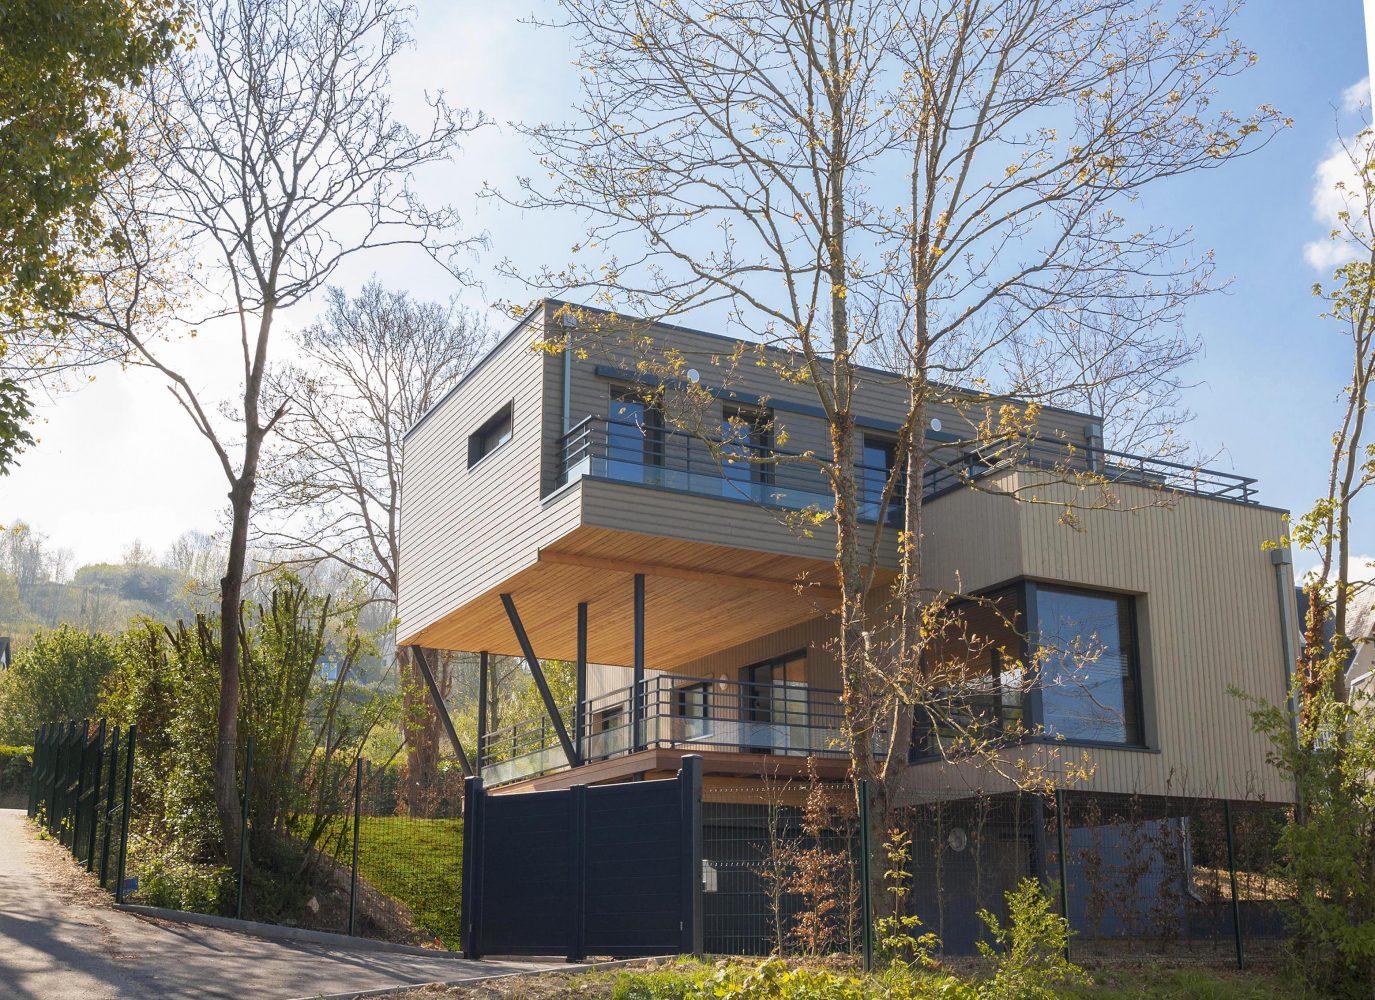 Philippe_Zerbib_Architecte_construction_maisons_ossature_bois_projet_maison_benhamou_MG_8474